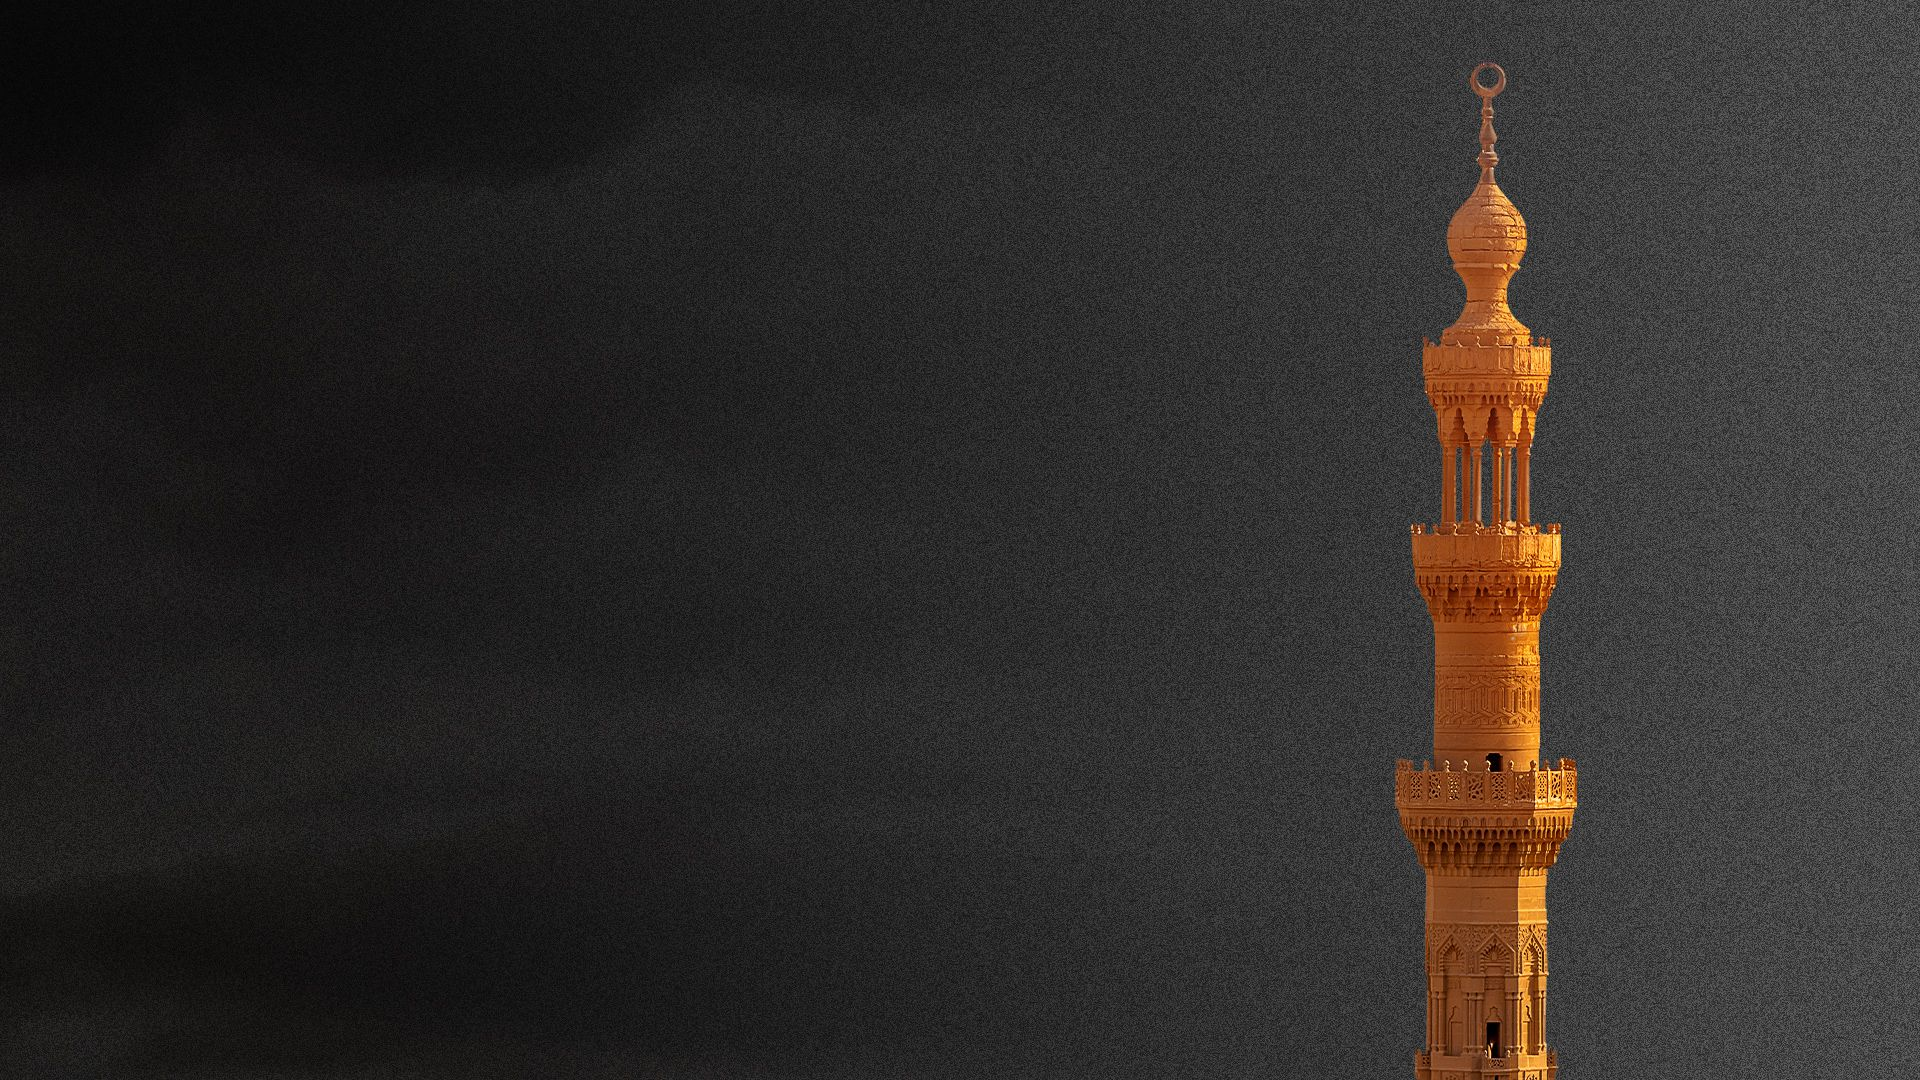 Illustration of a minaret on a foreboding background